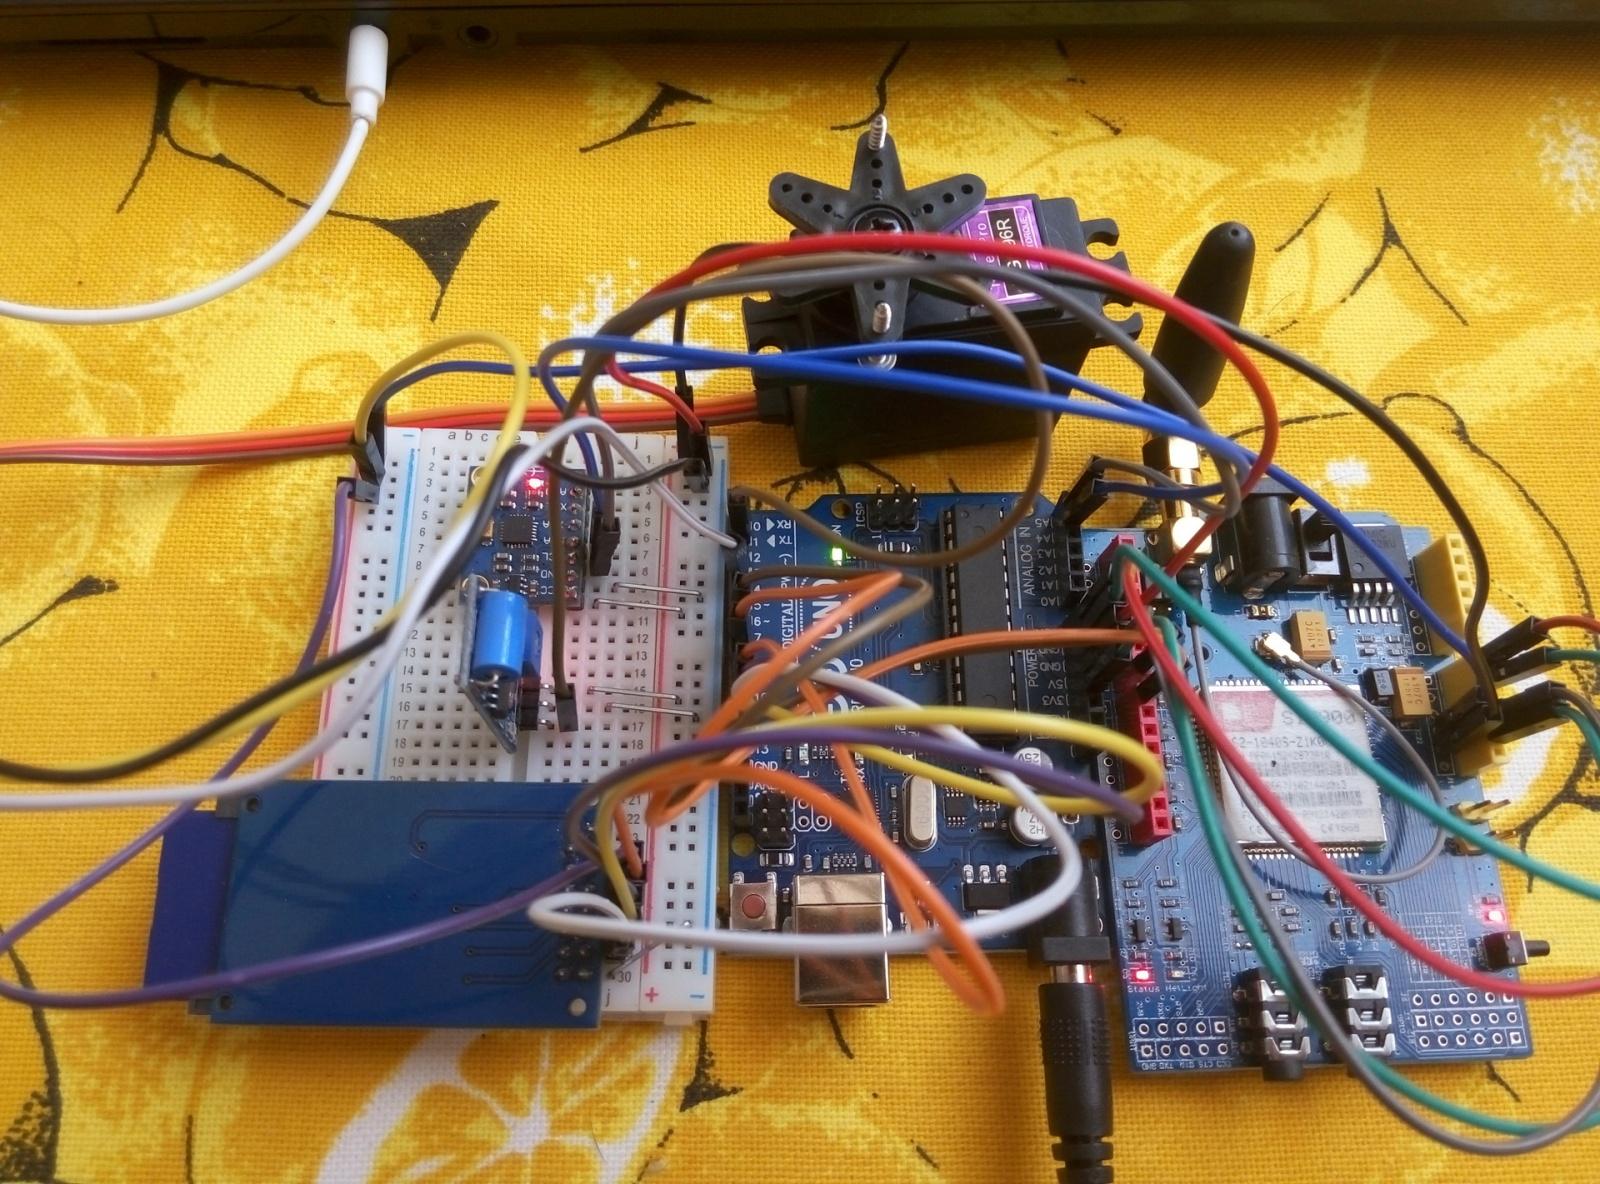 GSM-сигнализация для автомобиля на базе Arduino Uno - 9